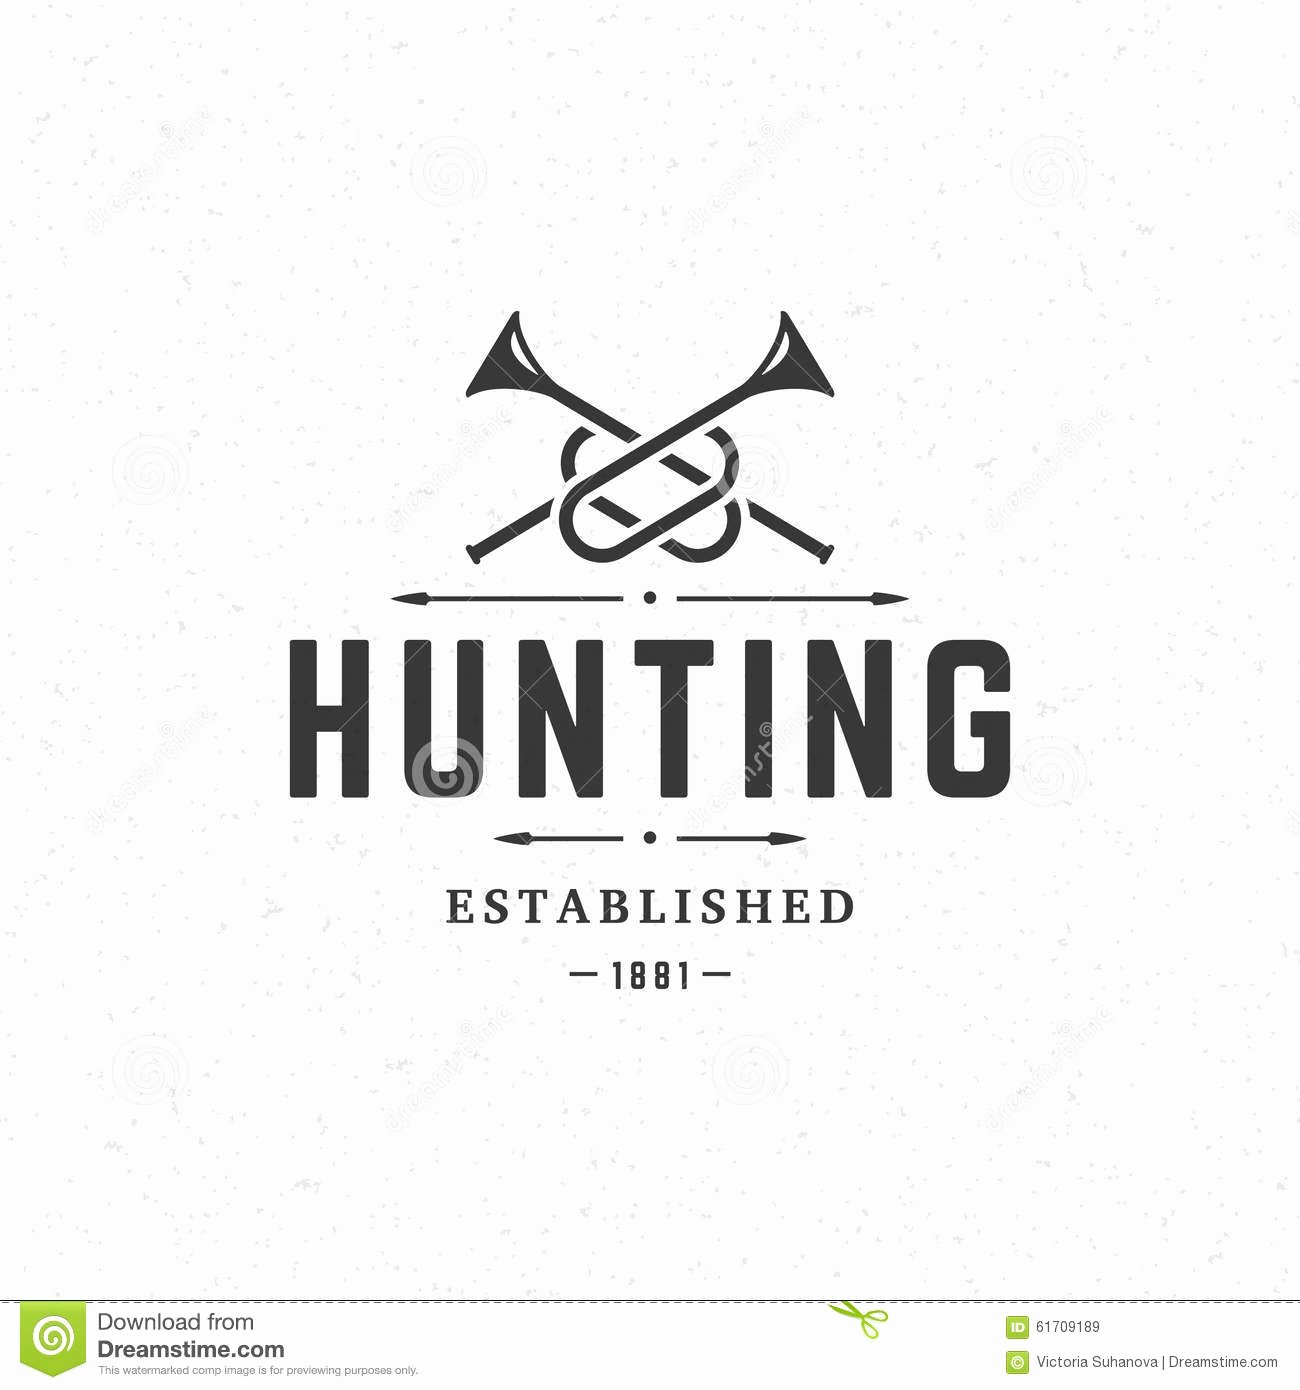 Hunting Logo Design Templates Unique Hunting Club Vintage Logo Template Emblem Stock Vector Illustration Of Logo Background